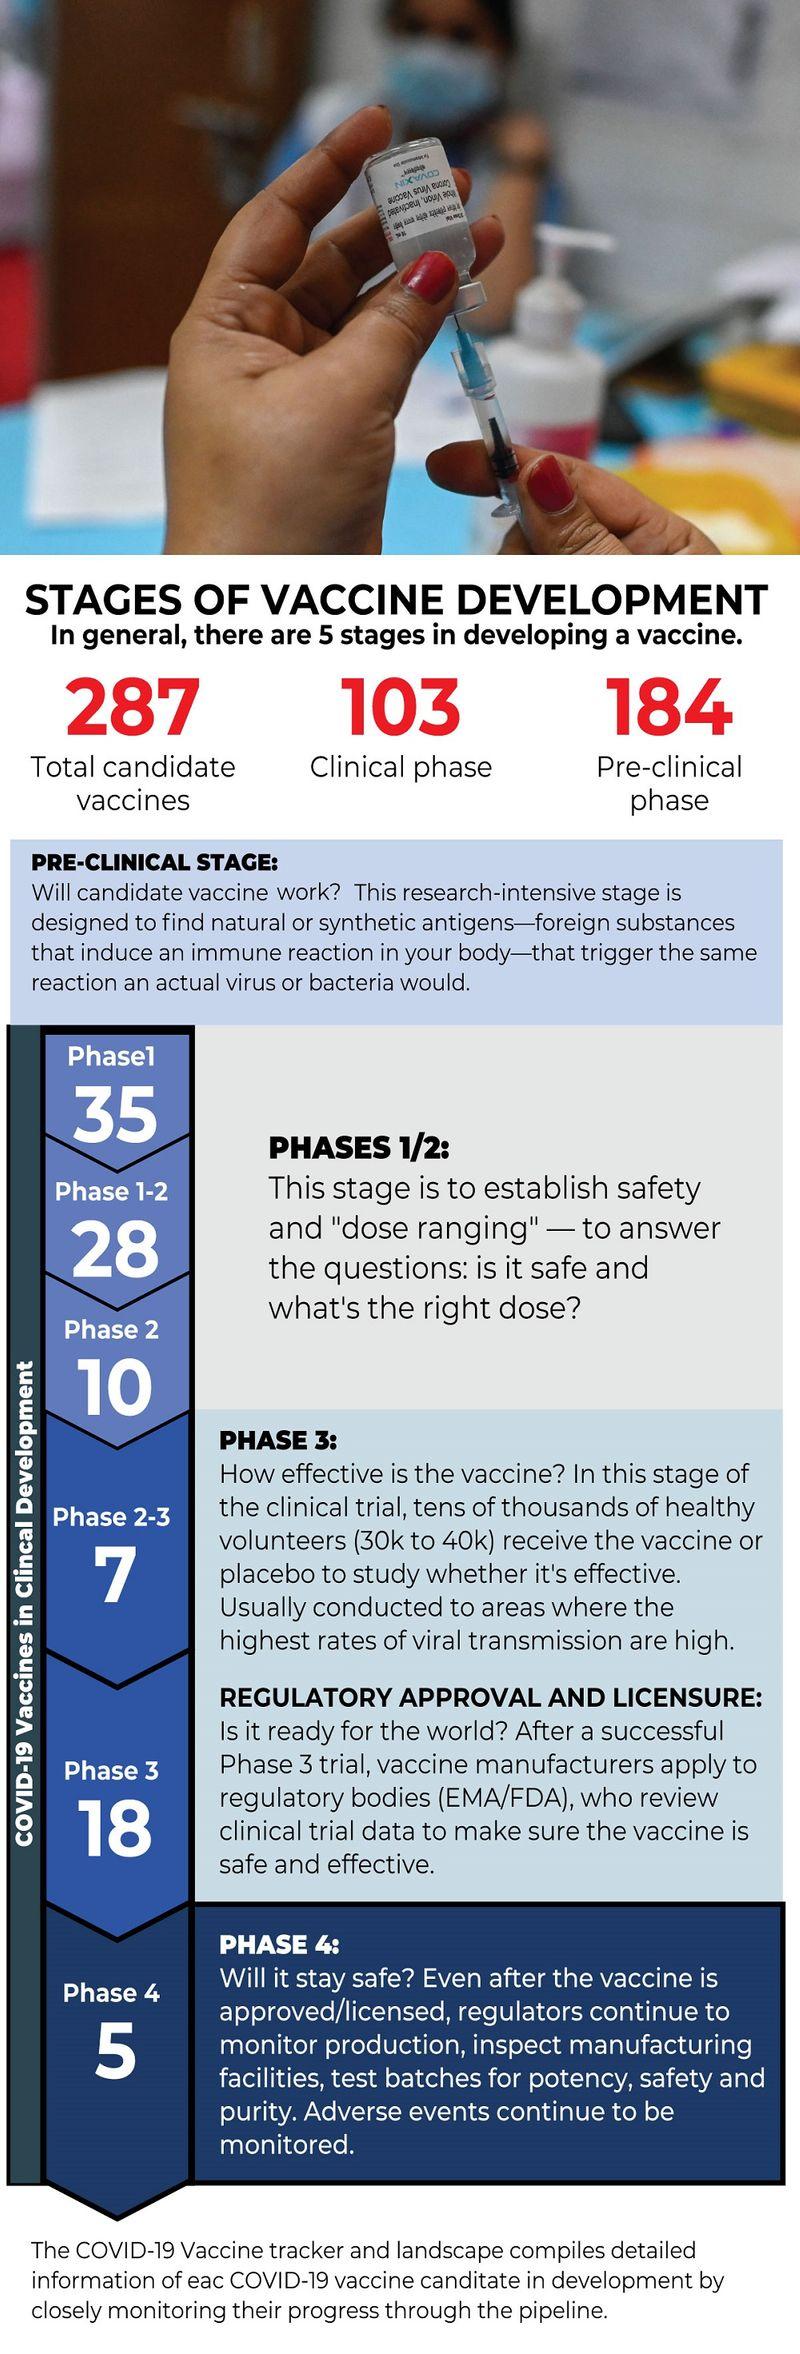 Vaccines undergoing trials